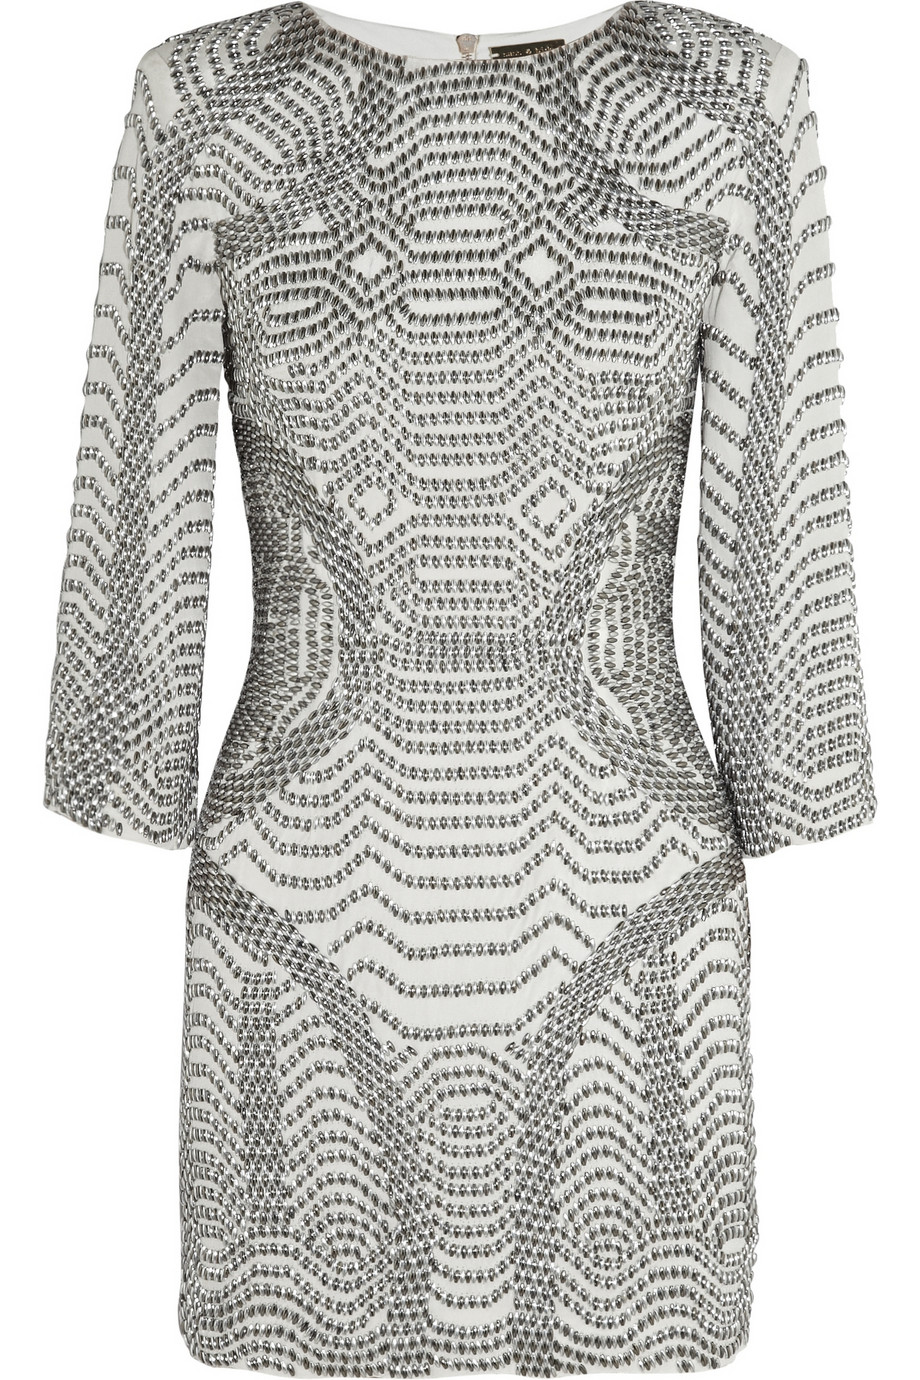 Here & Now beaded silk mini dress | Sass & bide | THE OUTNET